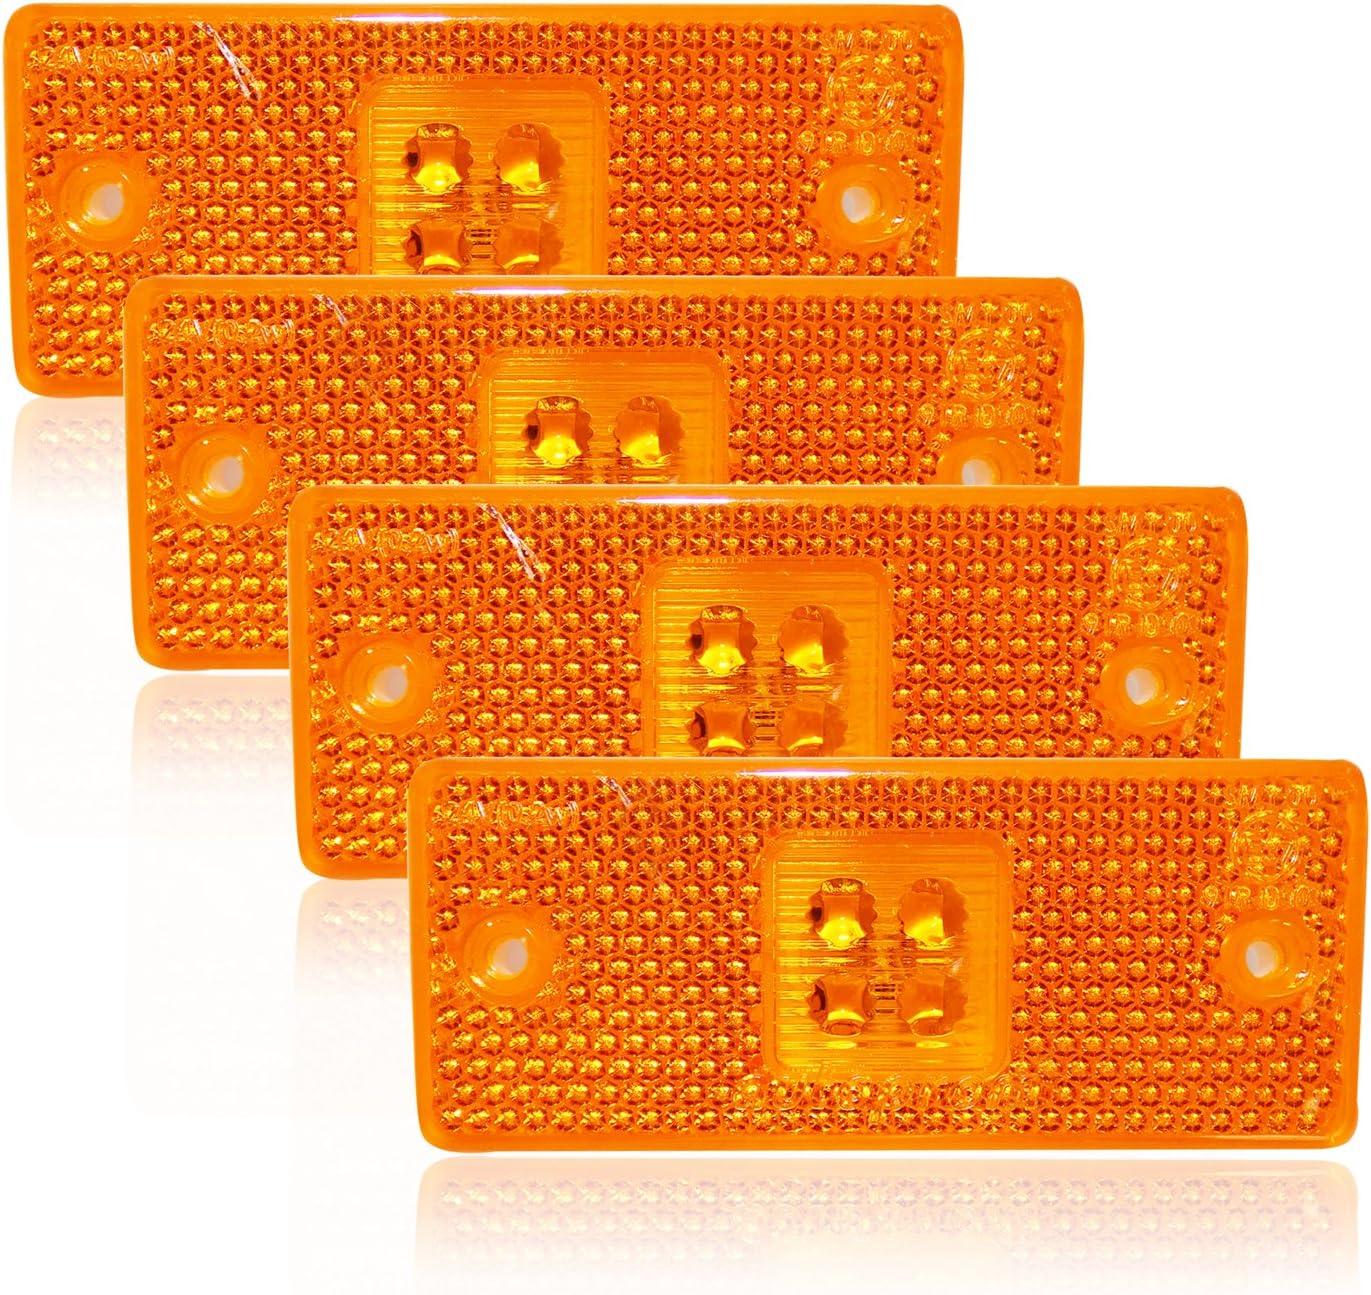 A1 24v Gelb Positionsleuchte 4 X 4 Smd Led Umrißleuchte Begrenzungsleuchte Lkw Pkw Auto